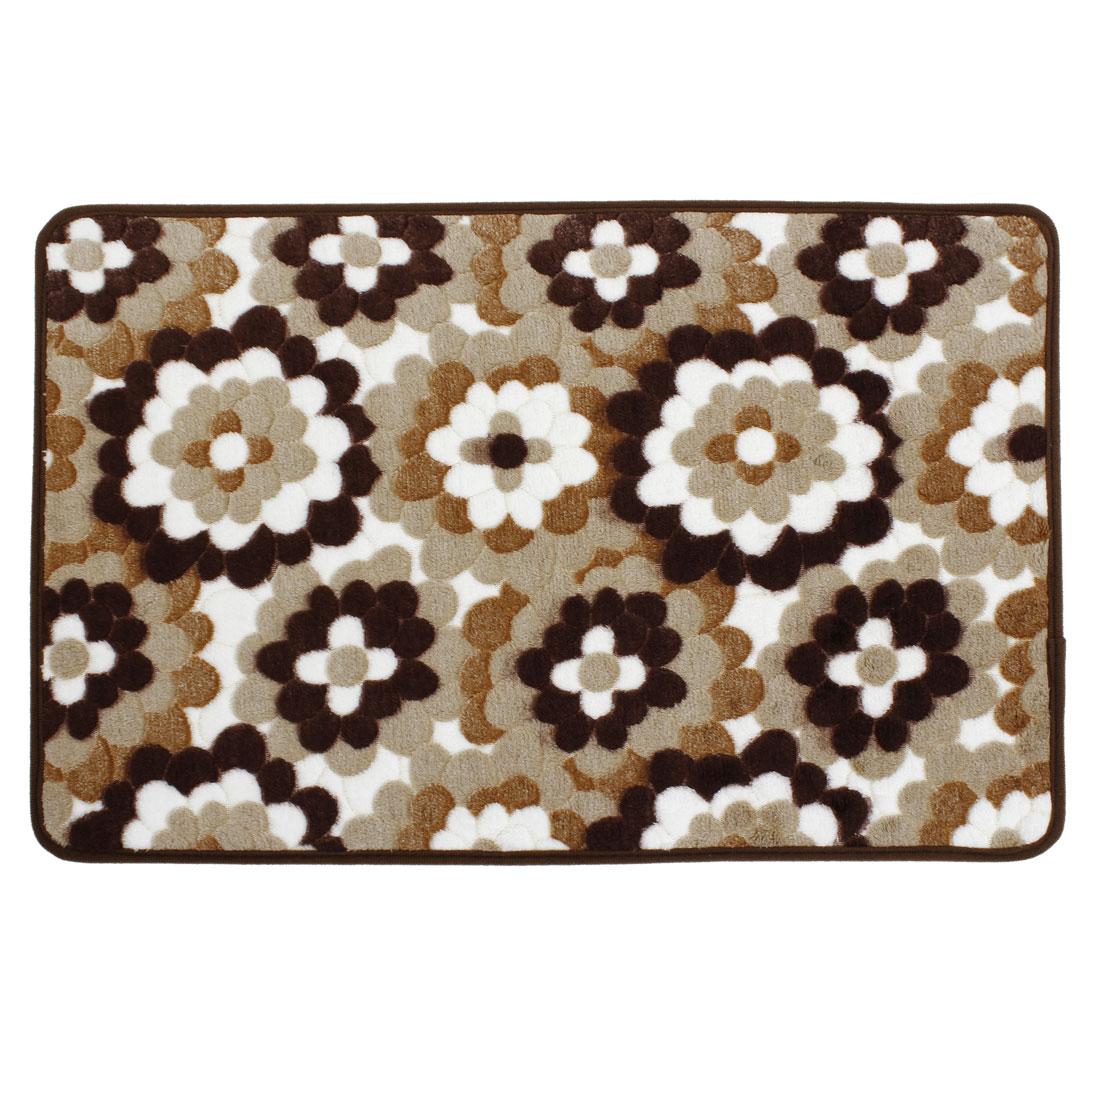 Brown White Flower Print Hallway Floor Mat Area Rug Carpet 60cm x 40cm